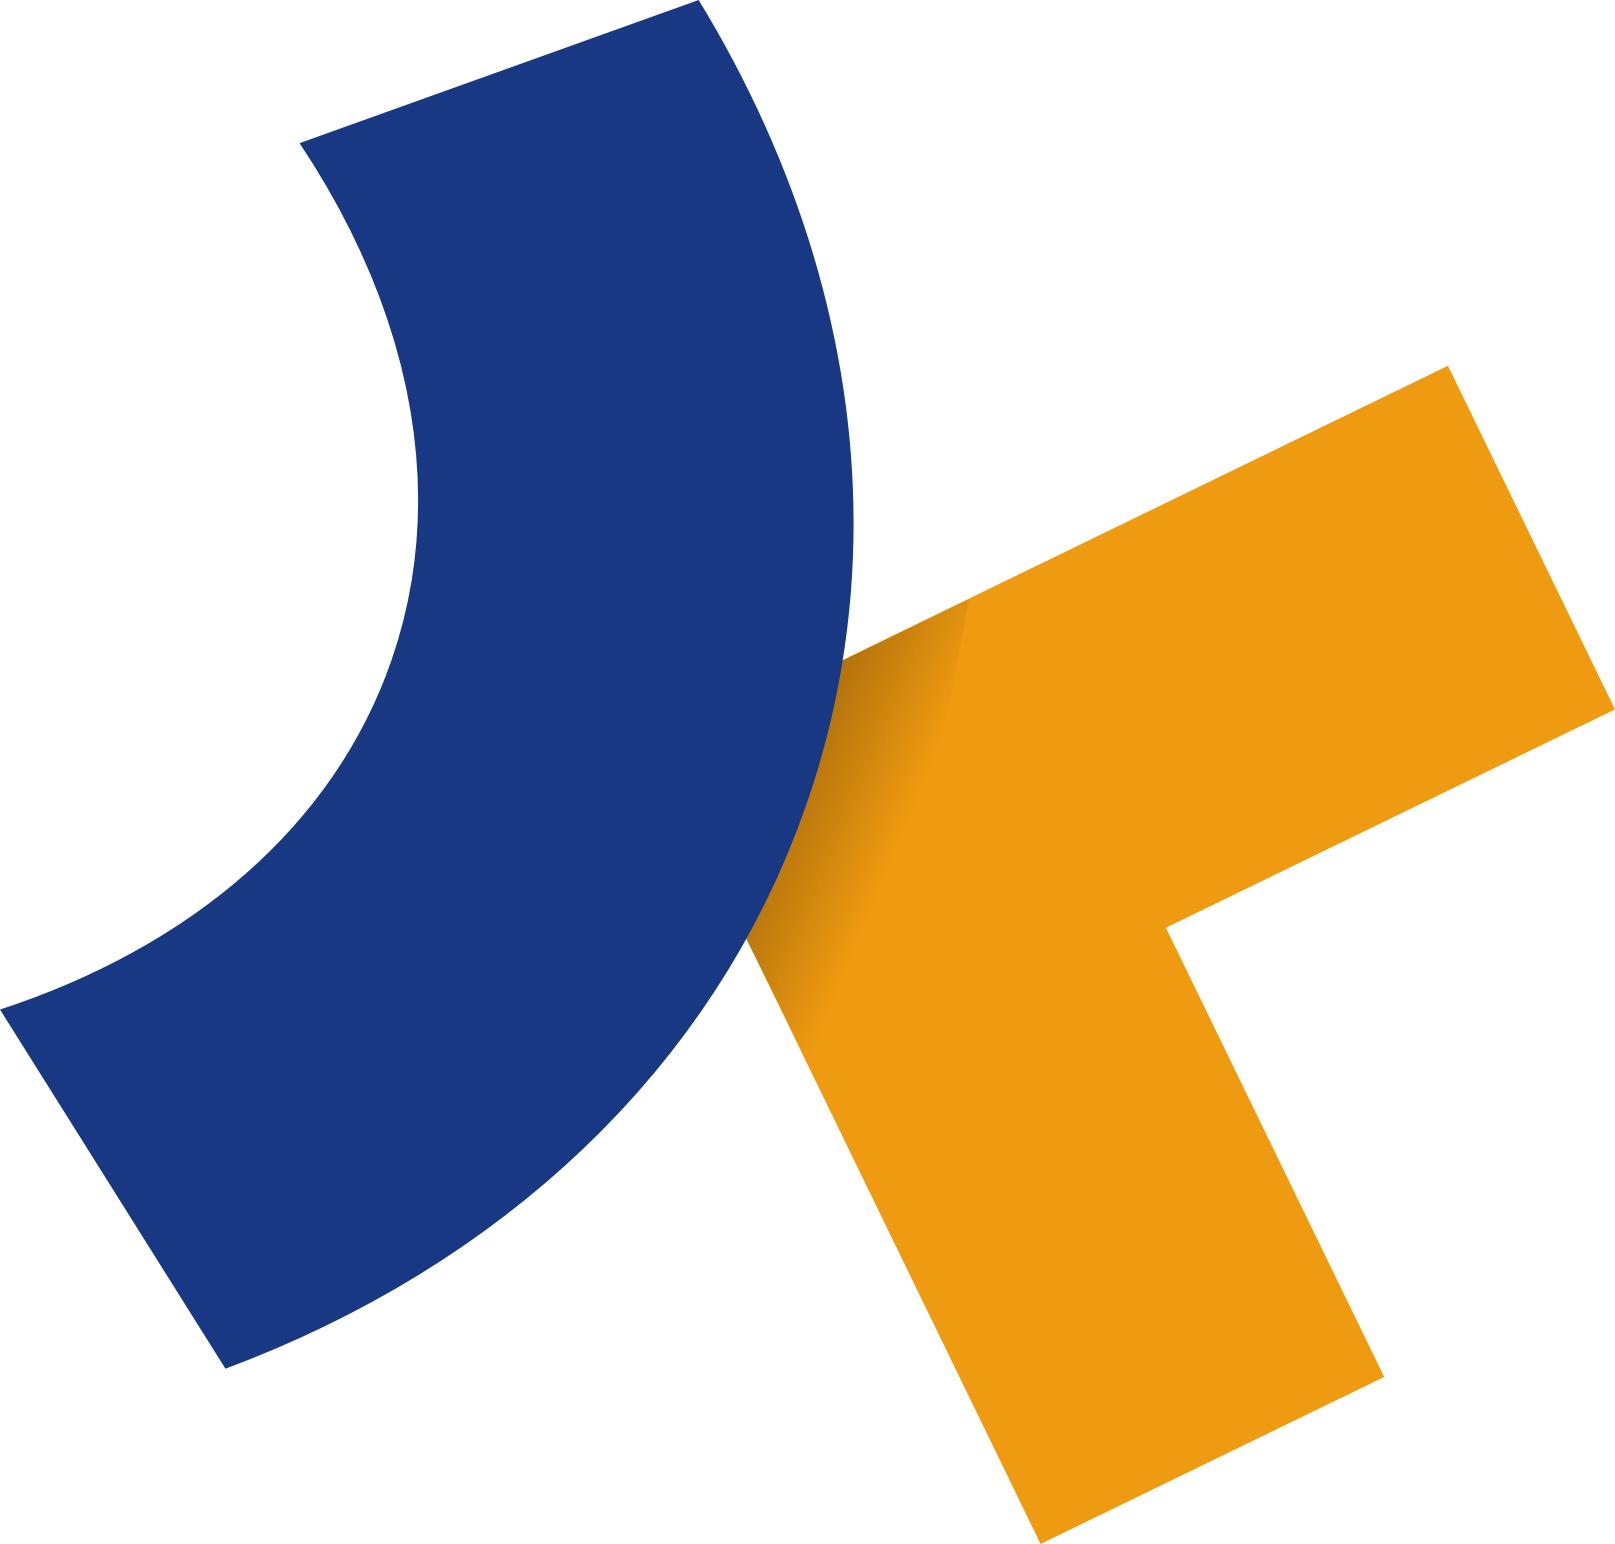 logo文件11.png